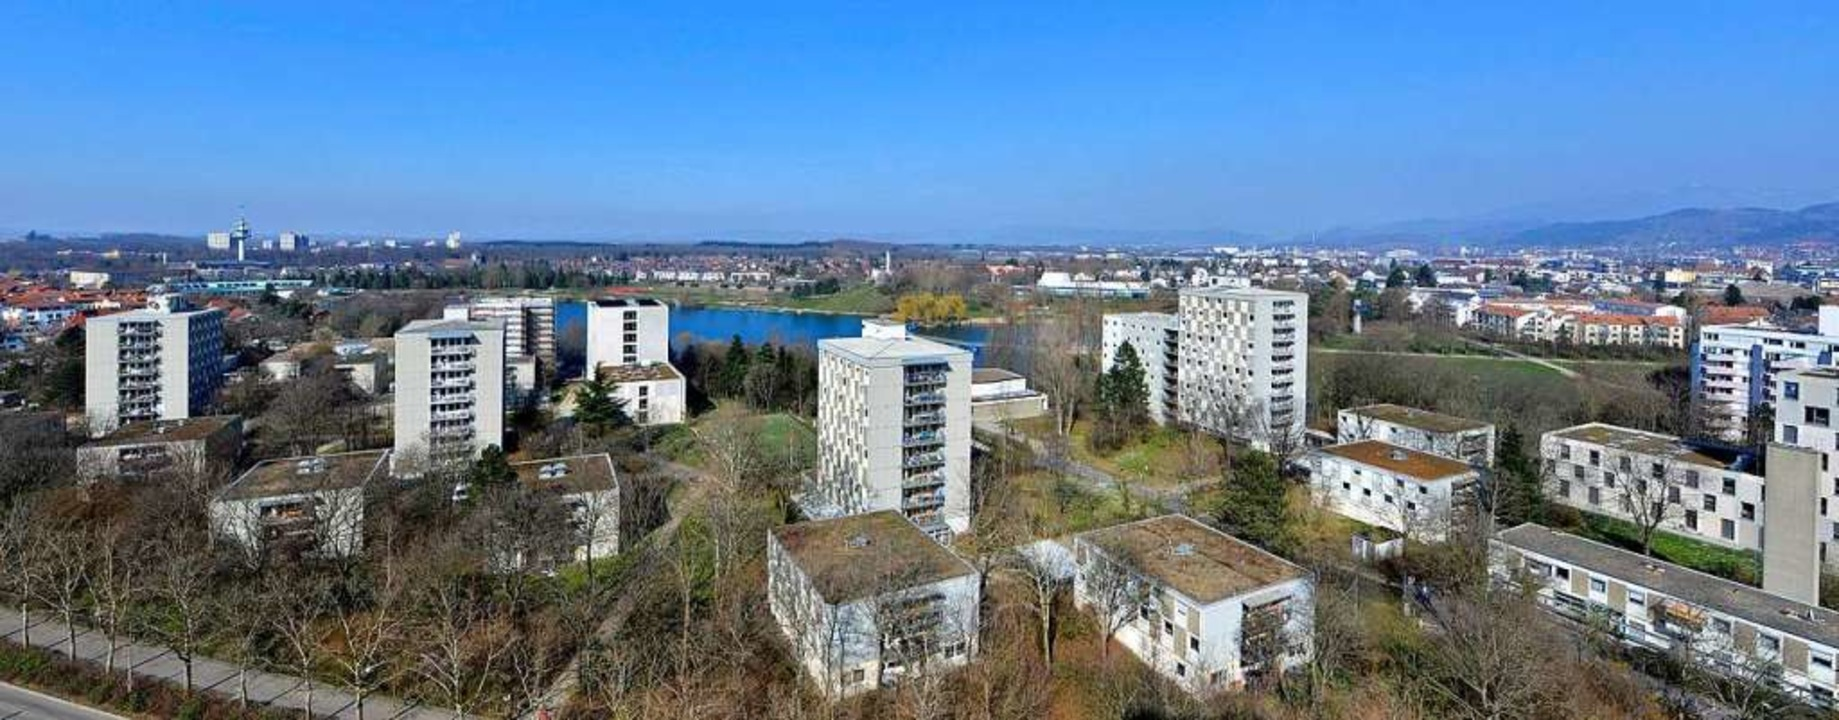 Die Studierendensiedlung am Seepark in Freiburg.  | Foto: Michael Bamberger